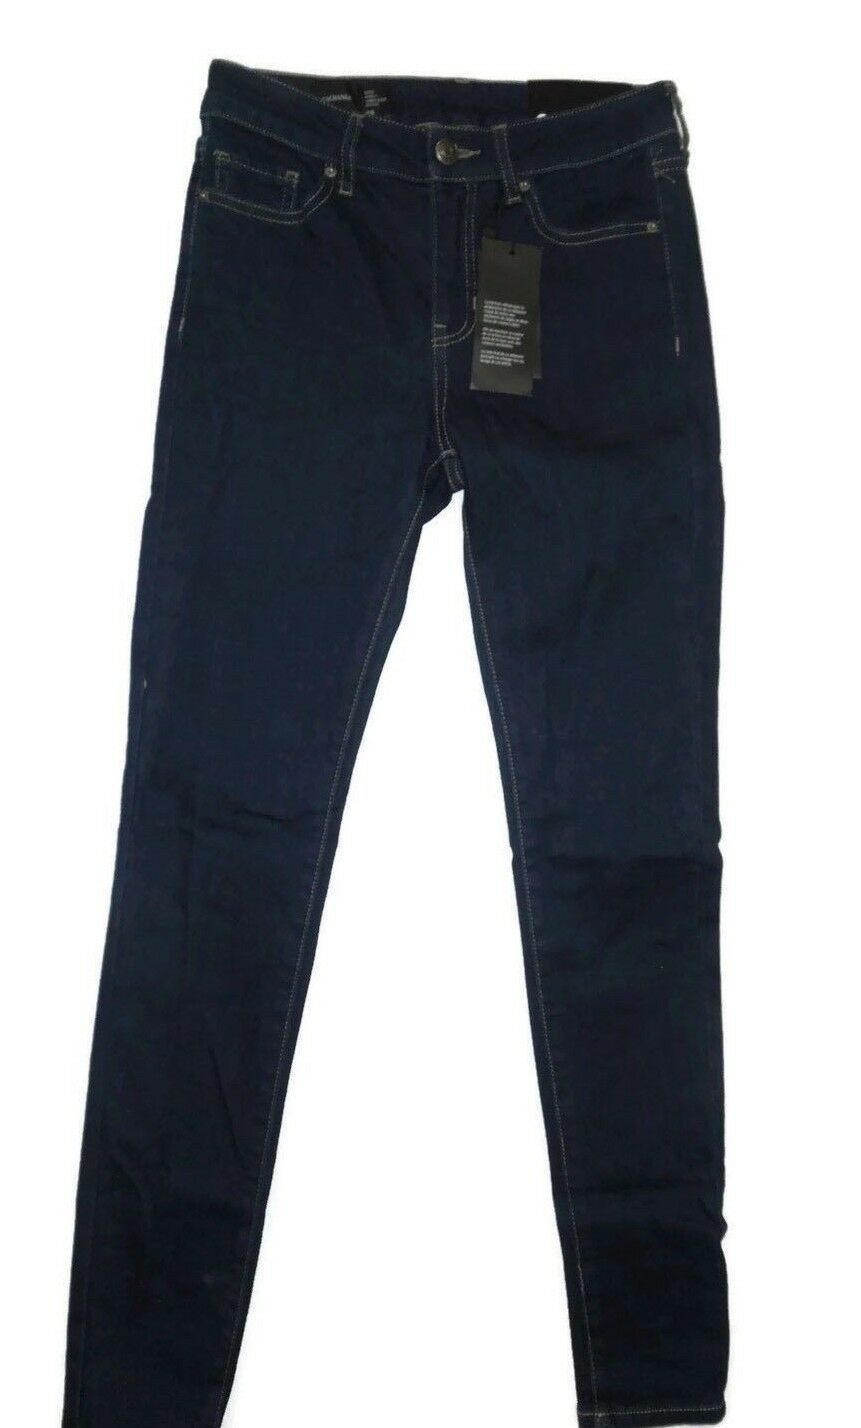 Armani Exchange super skinny dark bluee 1500 denim Jeans size 25